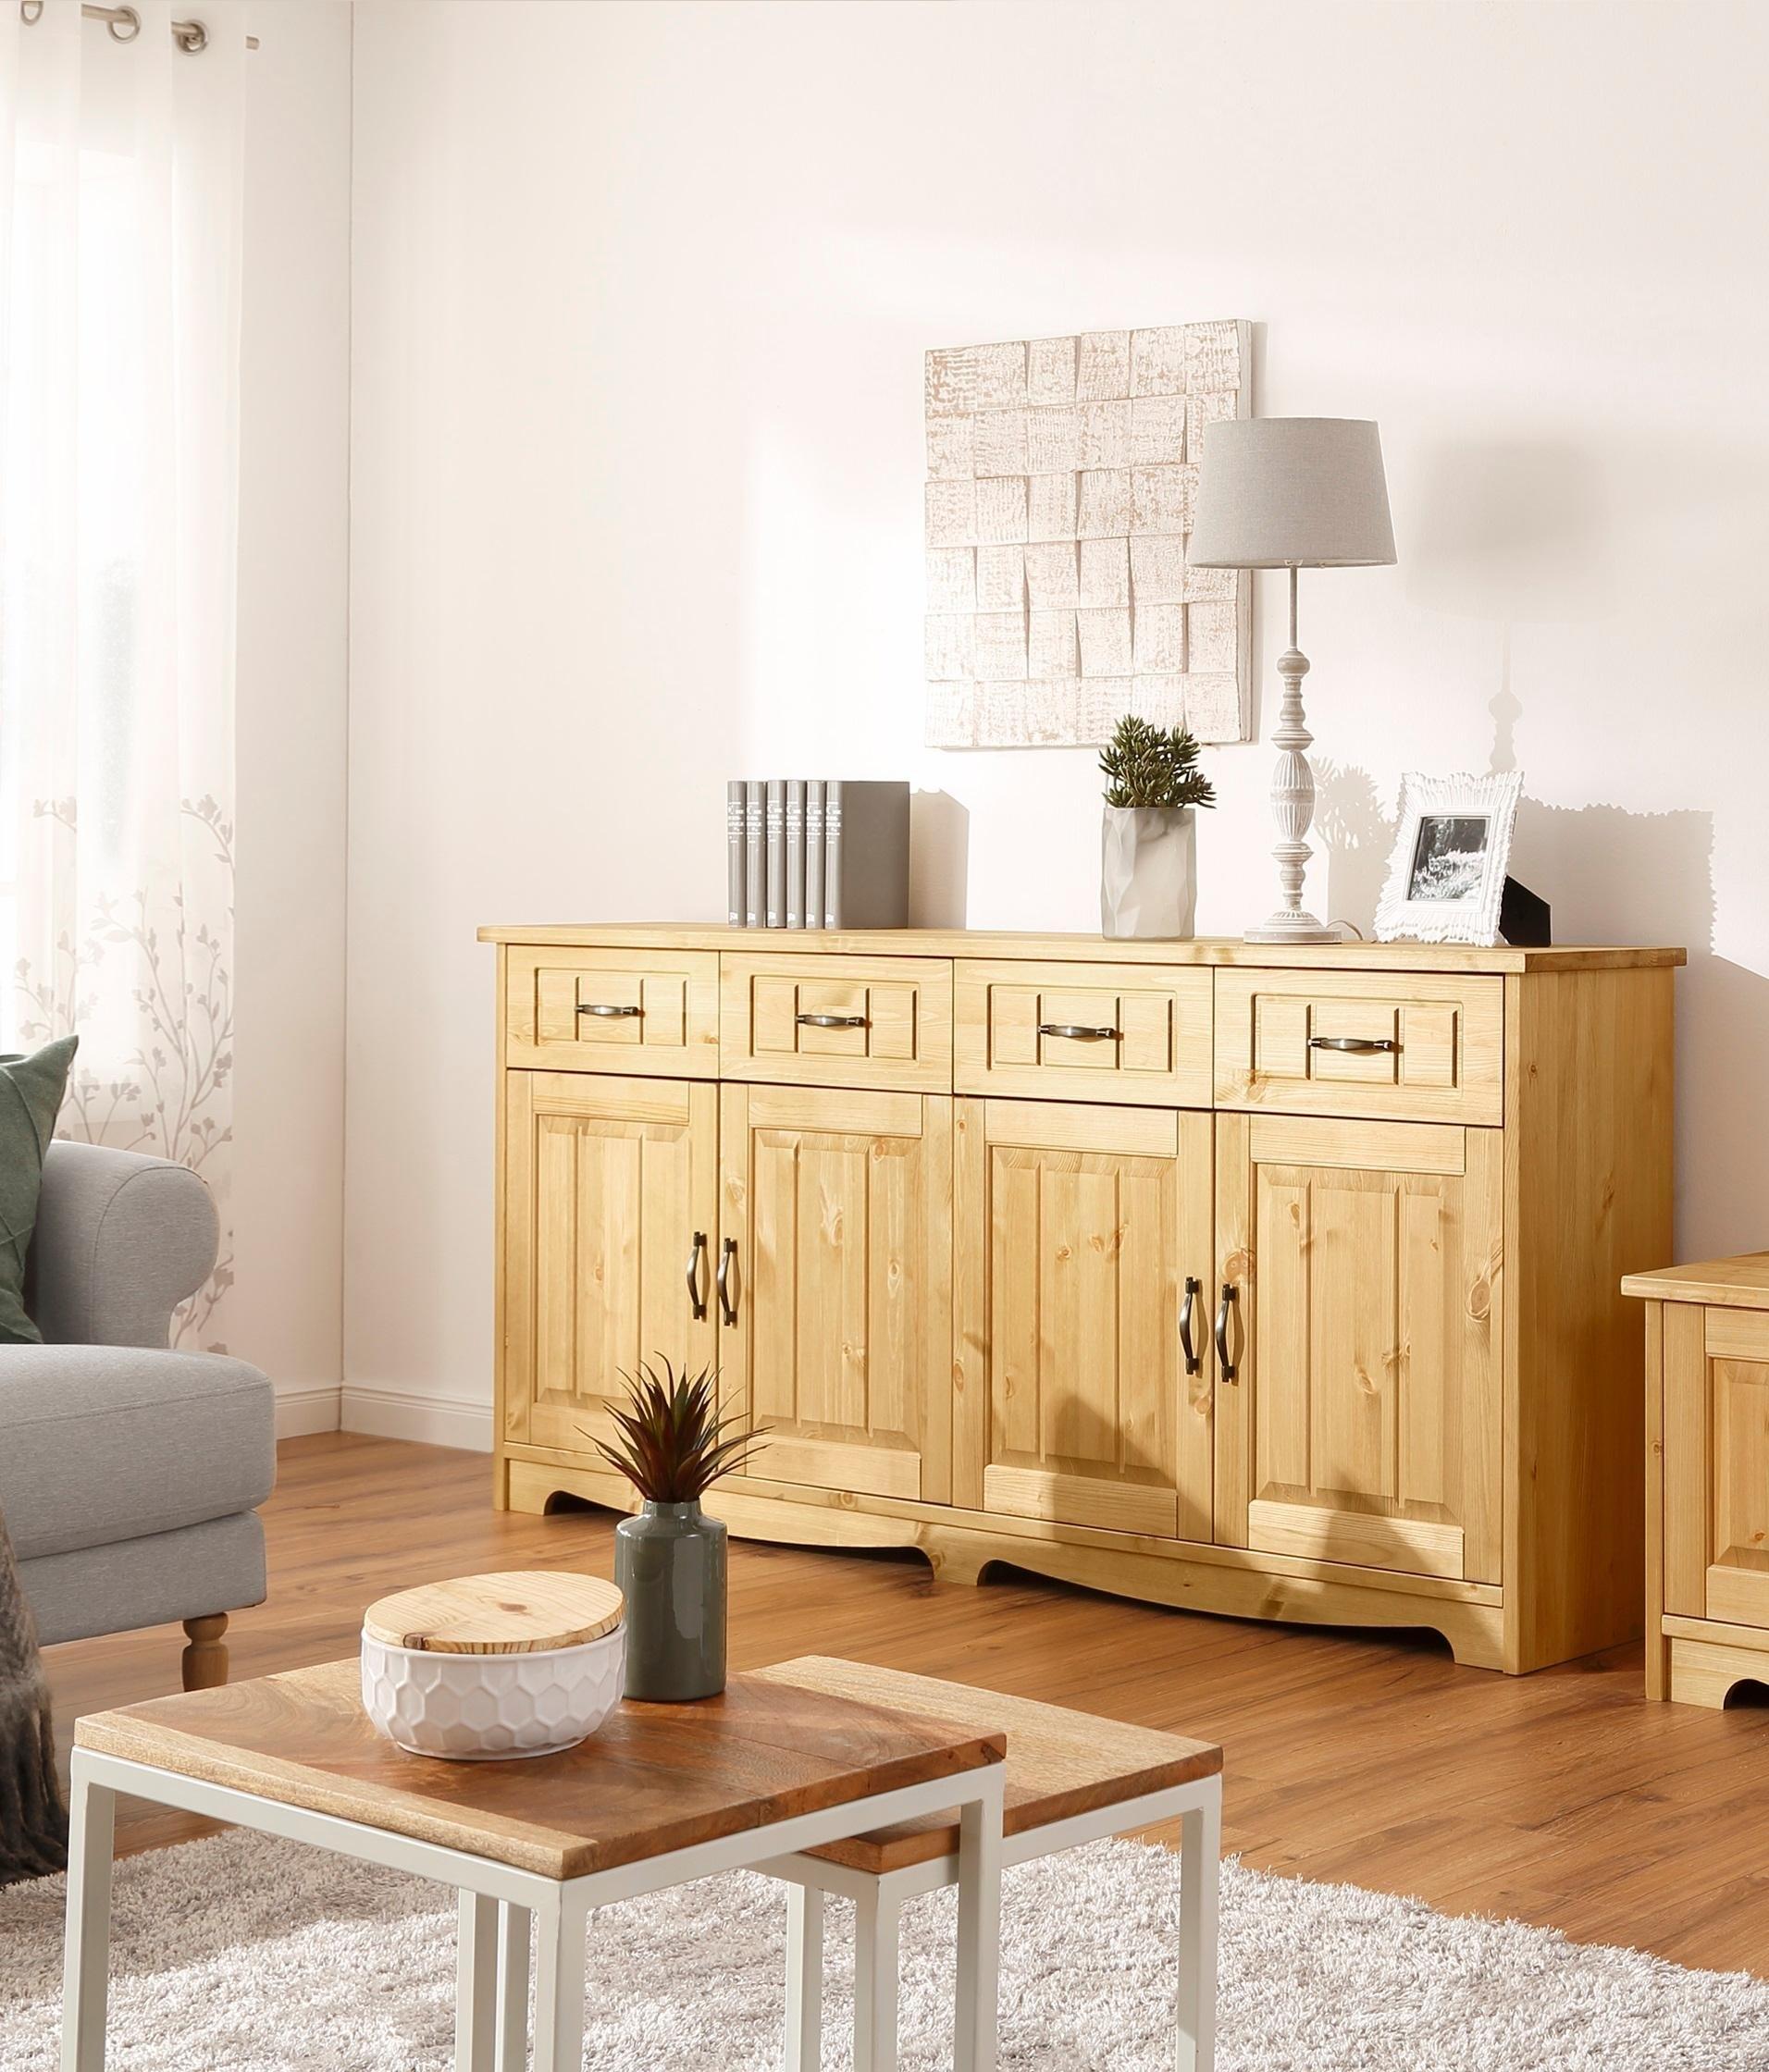 Home affaire dressoir Trinidad Breedte 194 cm nu online bestellen